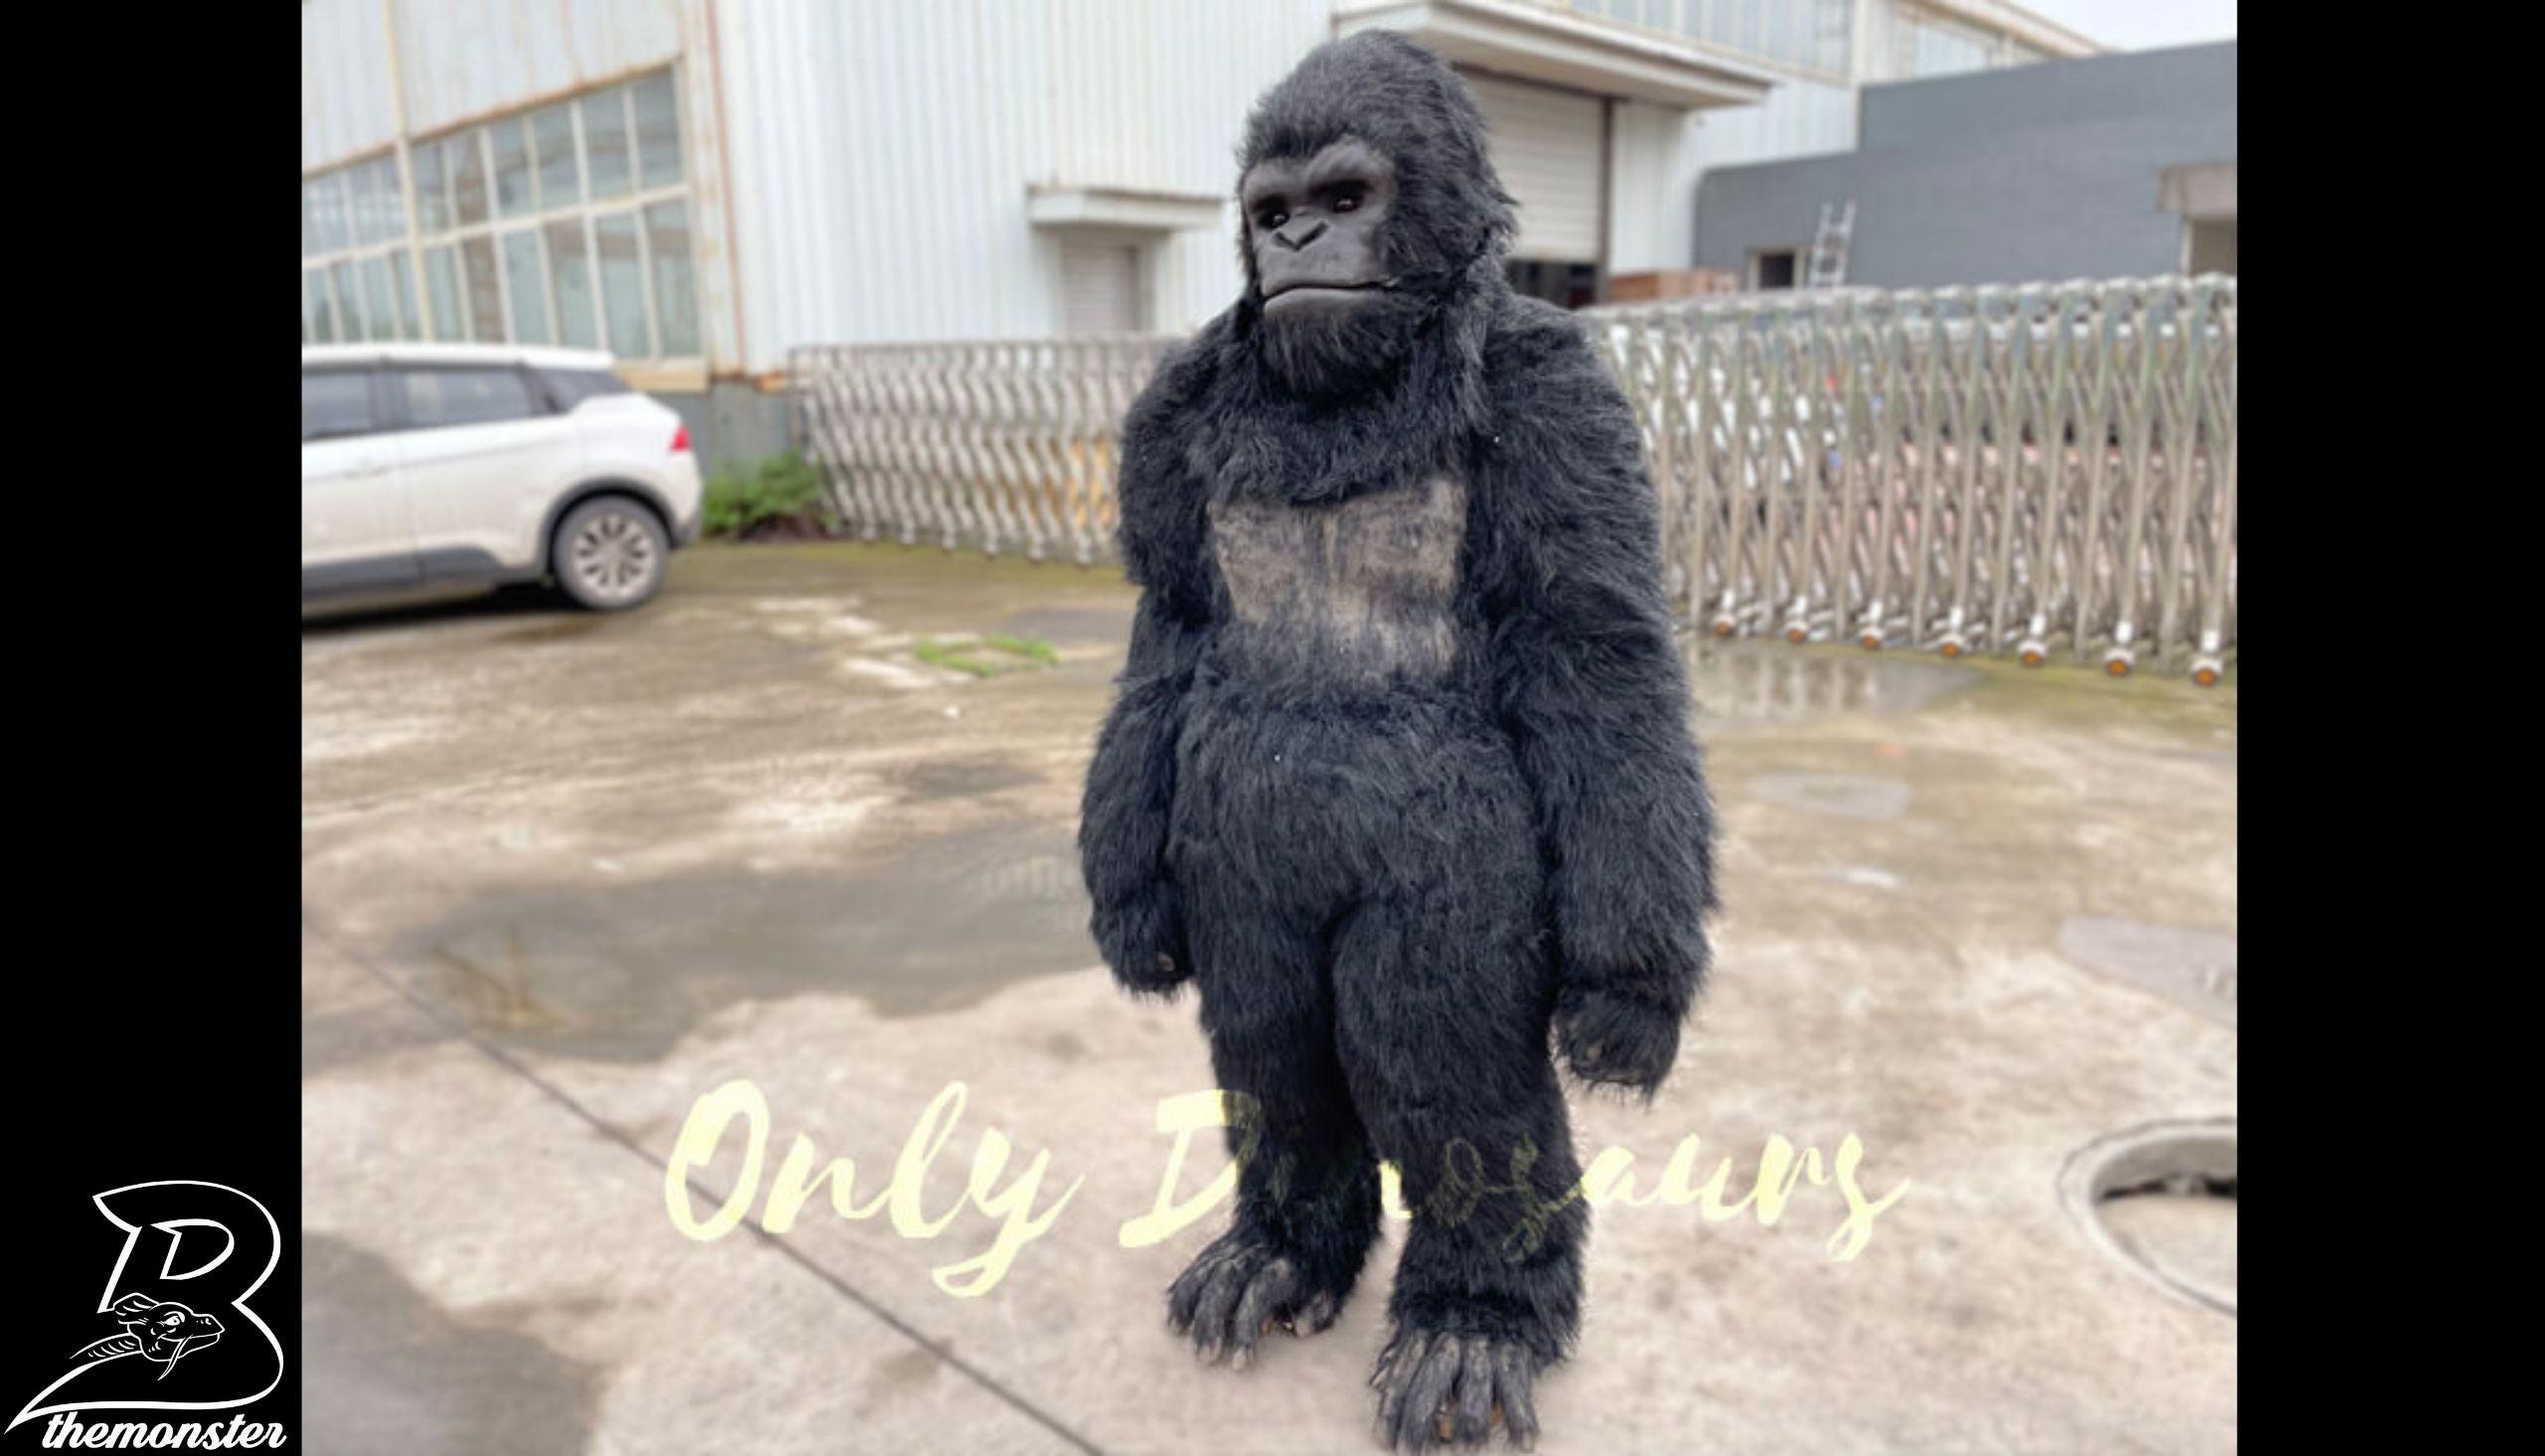 Custom Gorilla Animal Costume Per Shop Bthemonster.com